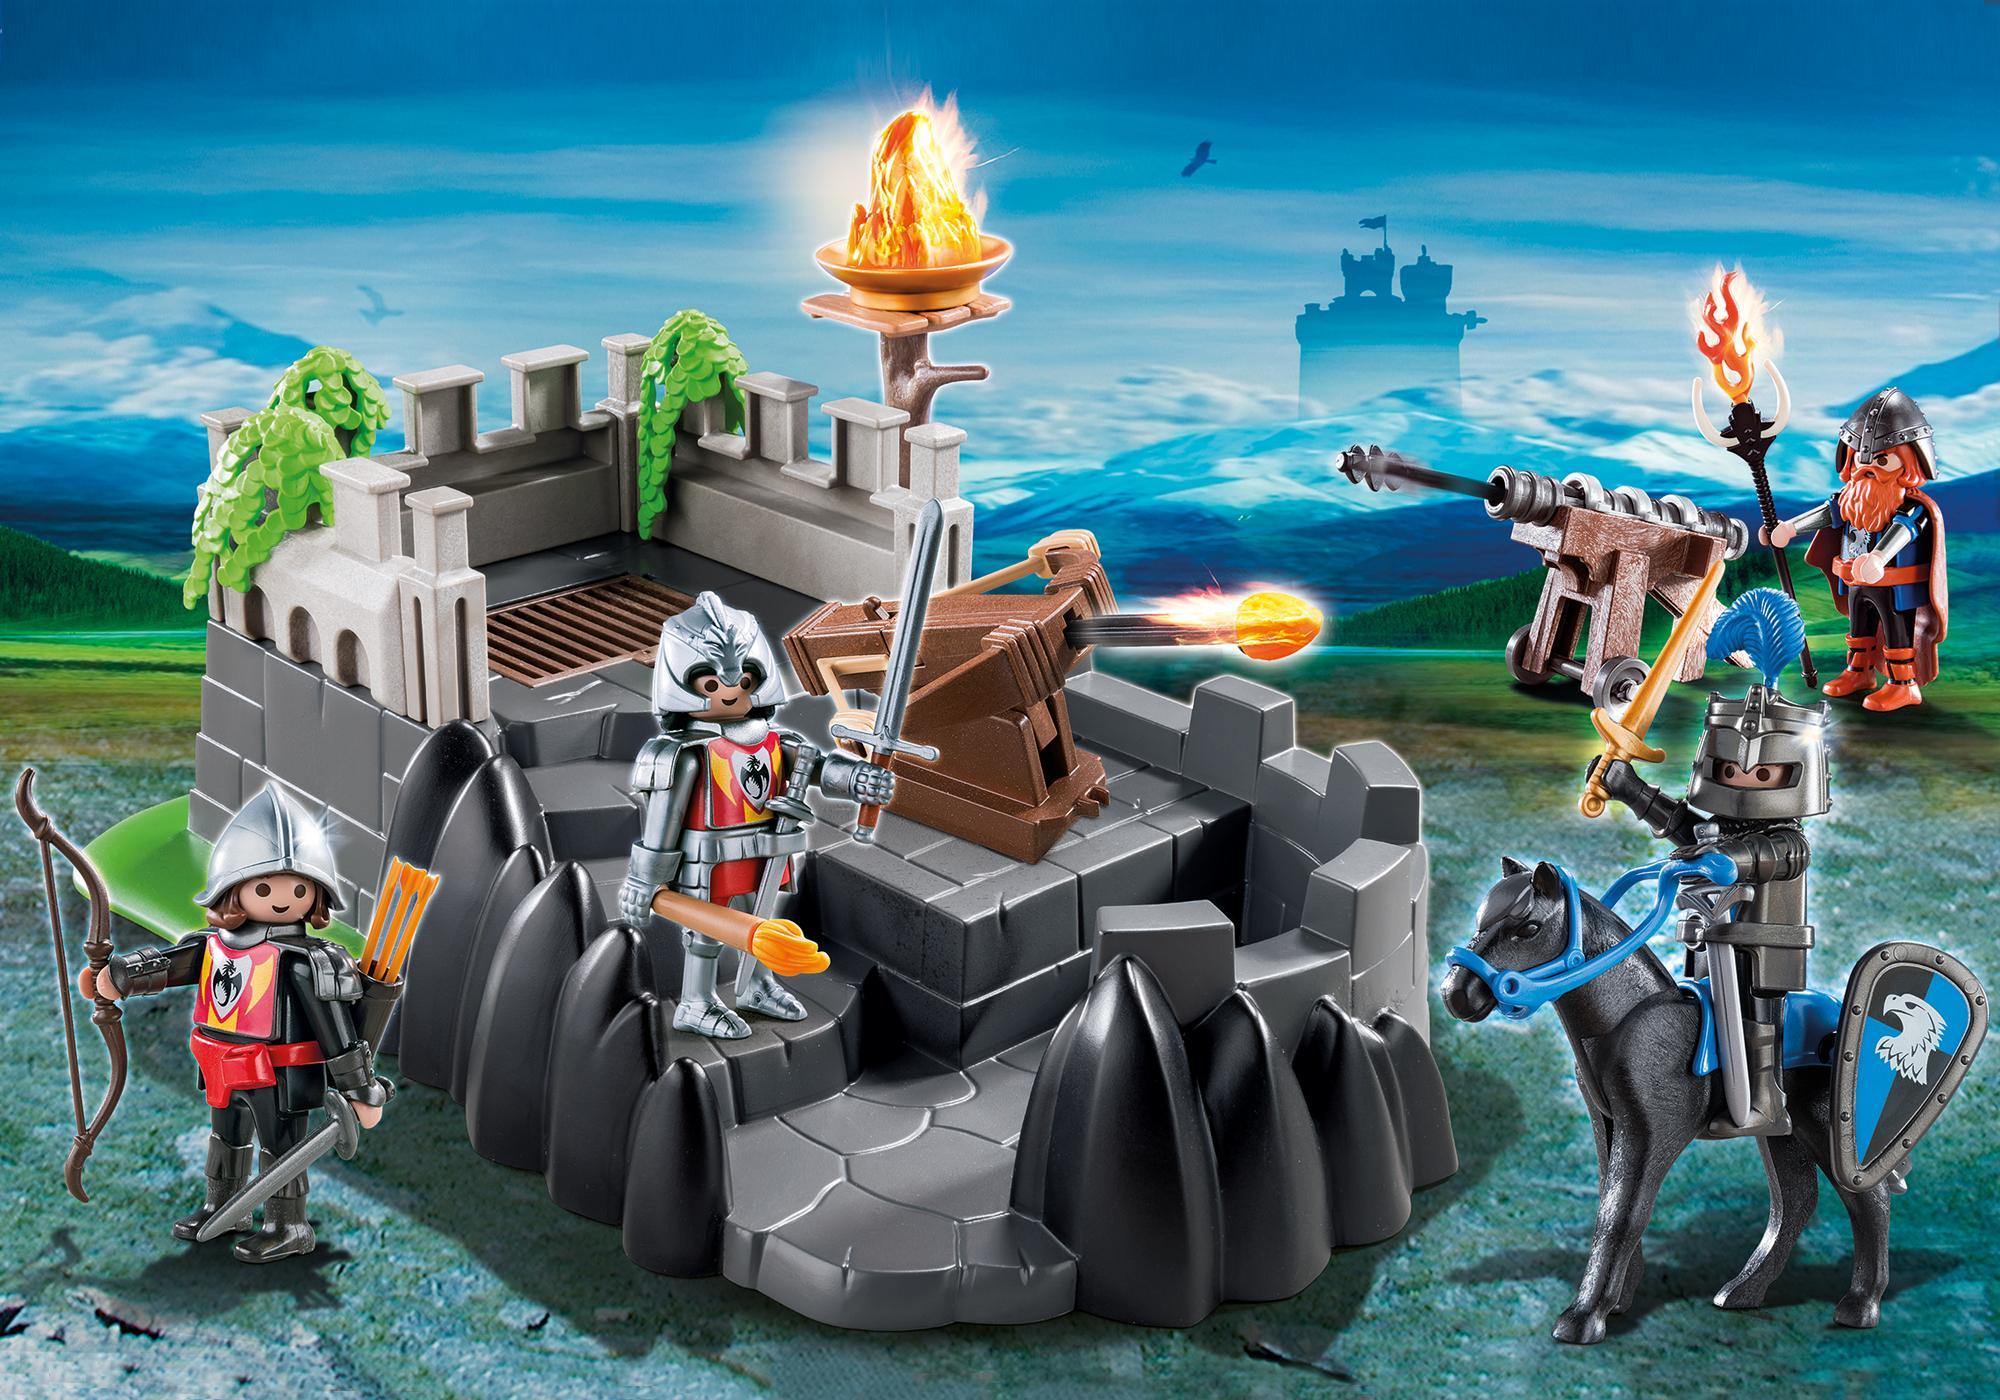 http://media.playmobil.com/i/playmobil/6627_product_detail/Drachenritter-Bastion